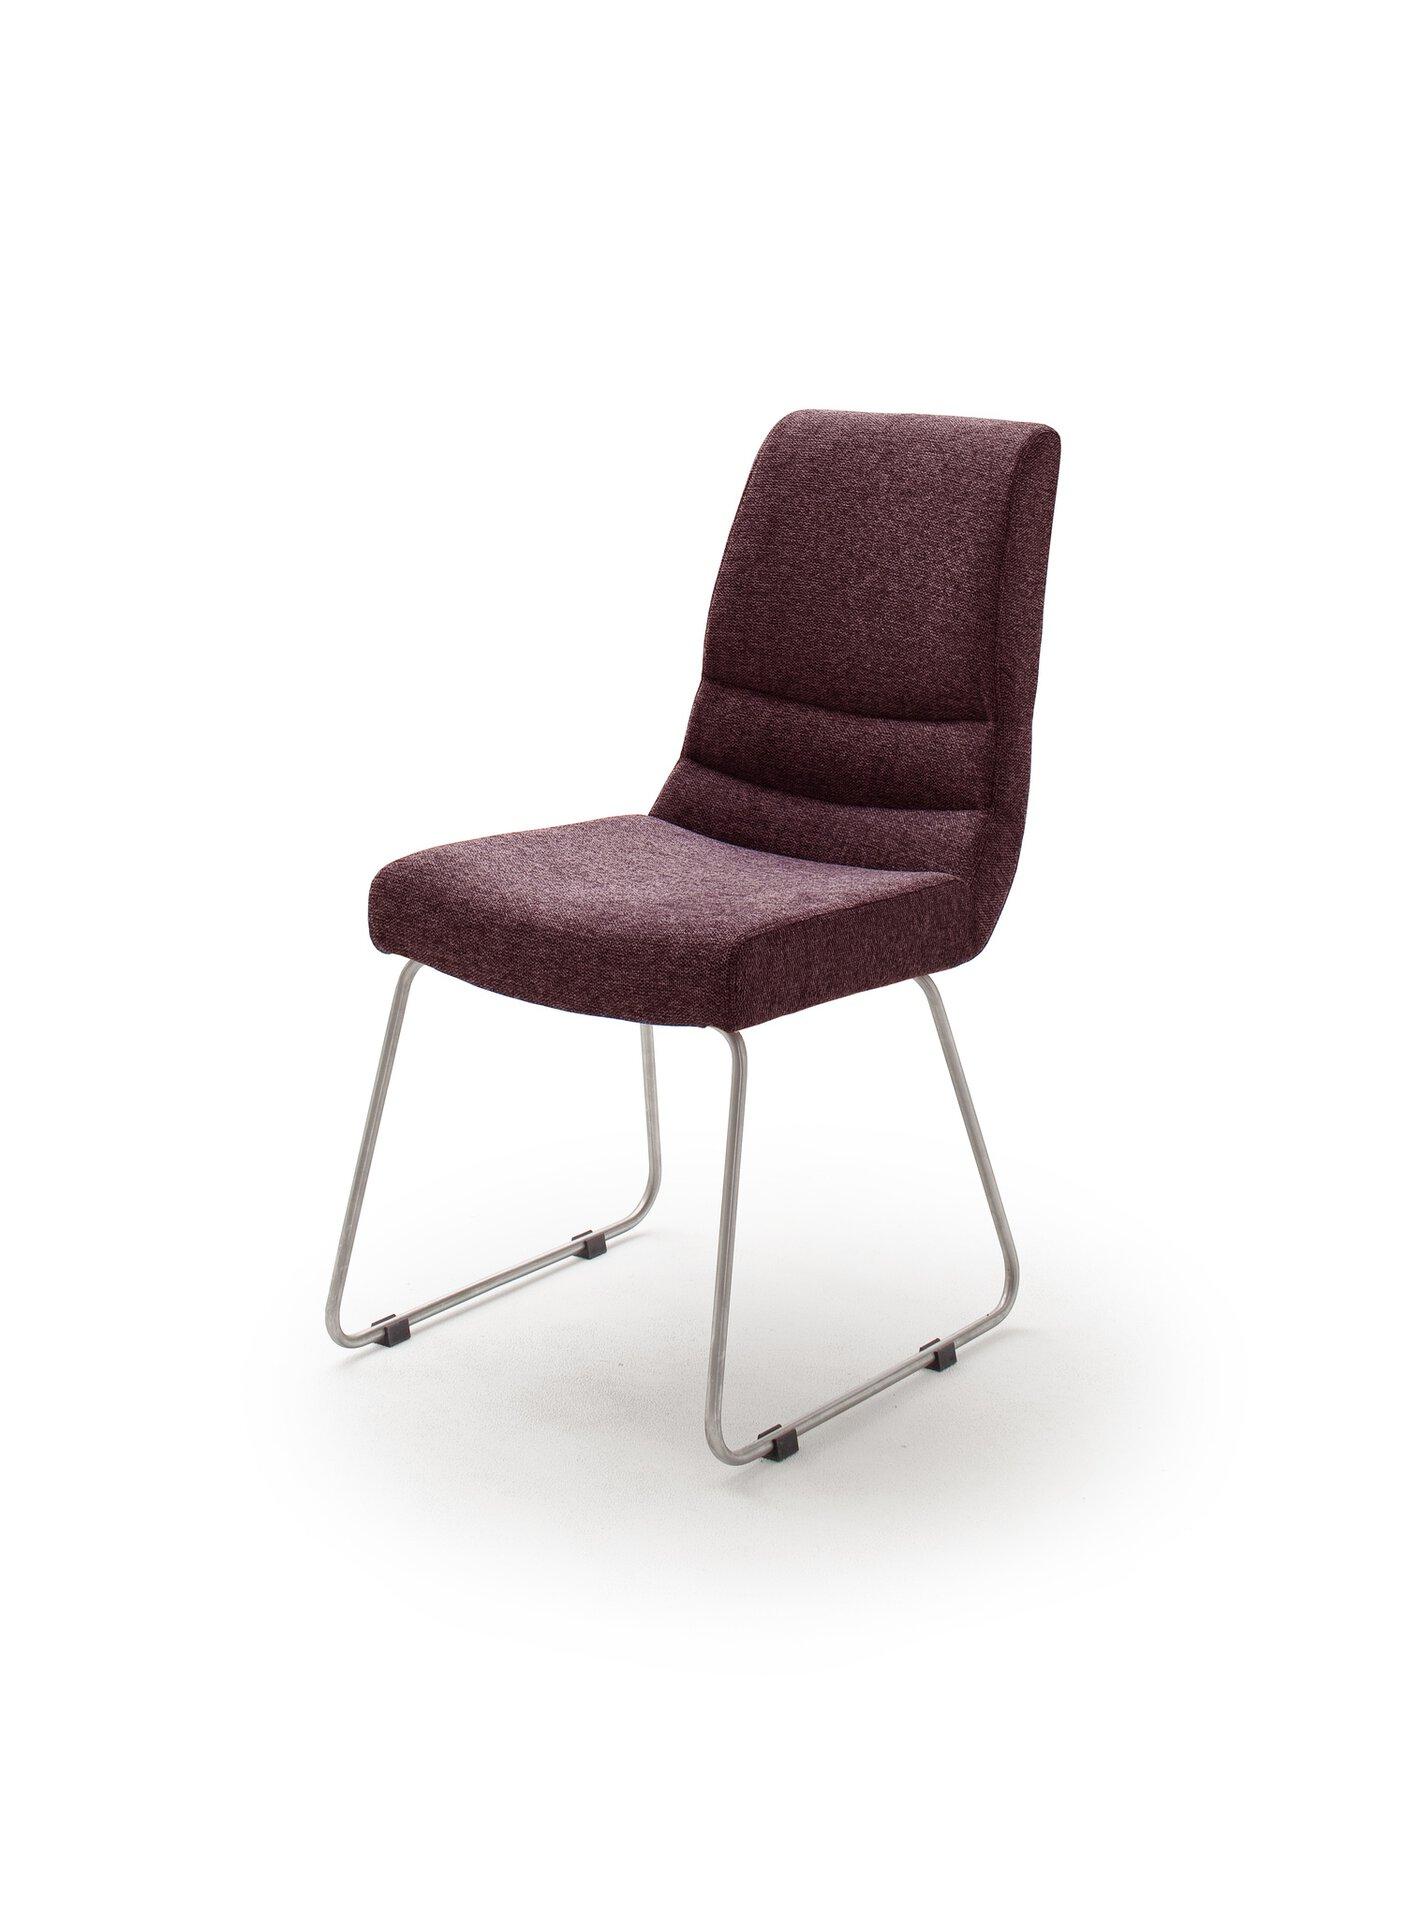 Kufenstuhl MONTERA MCA furniture Textil mehrfarbig 43 x 48 x 45 cm